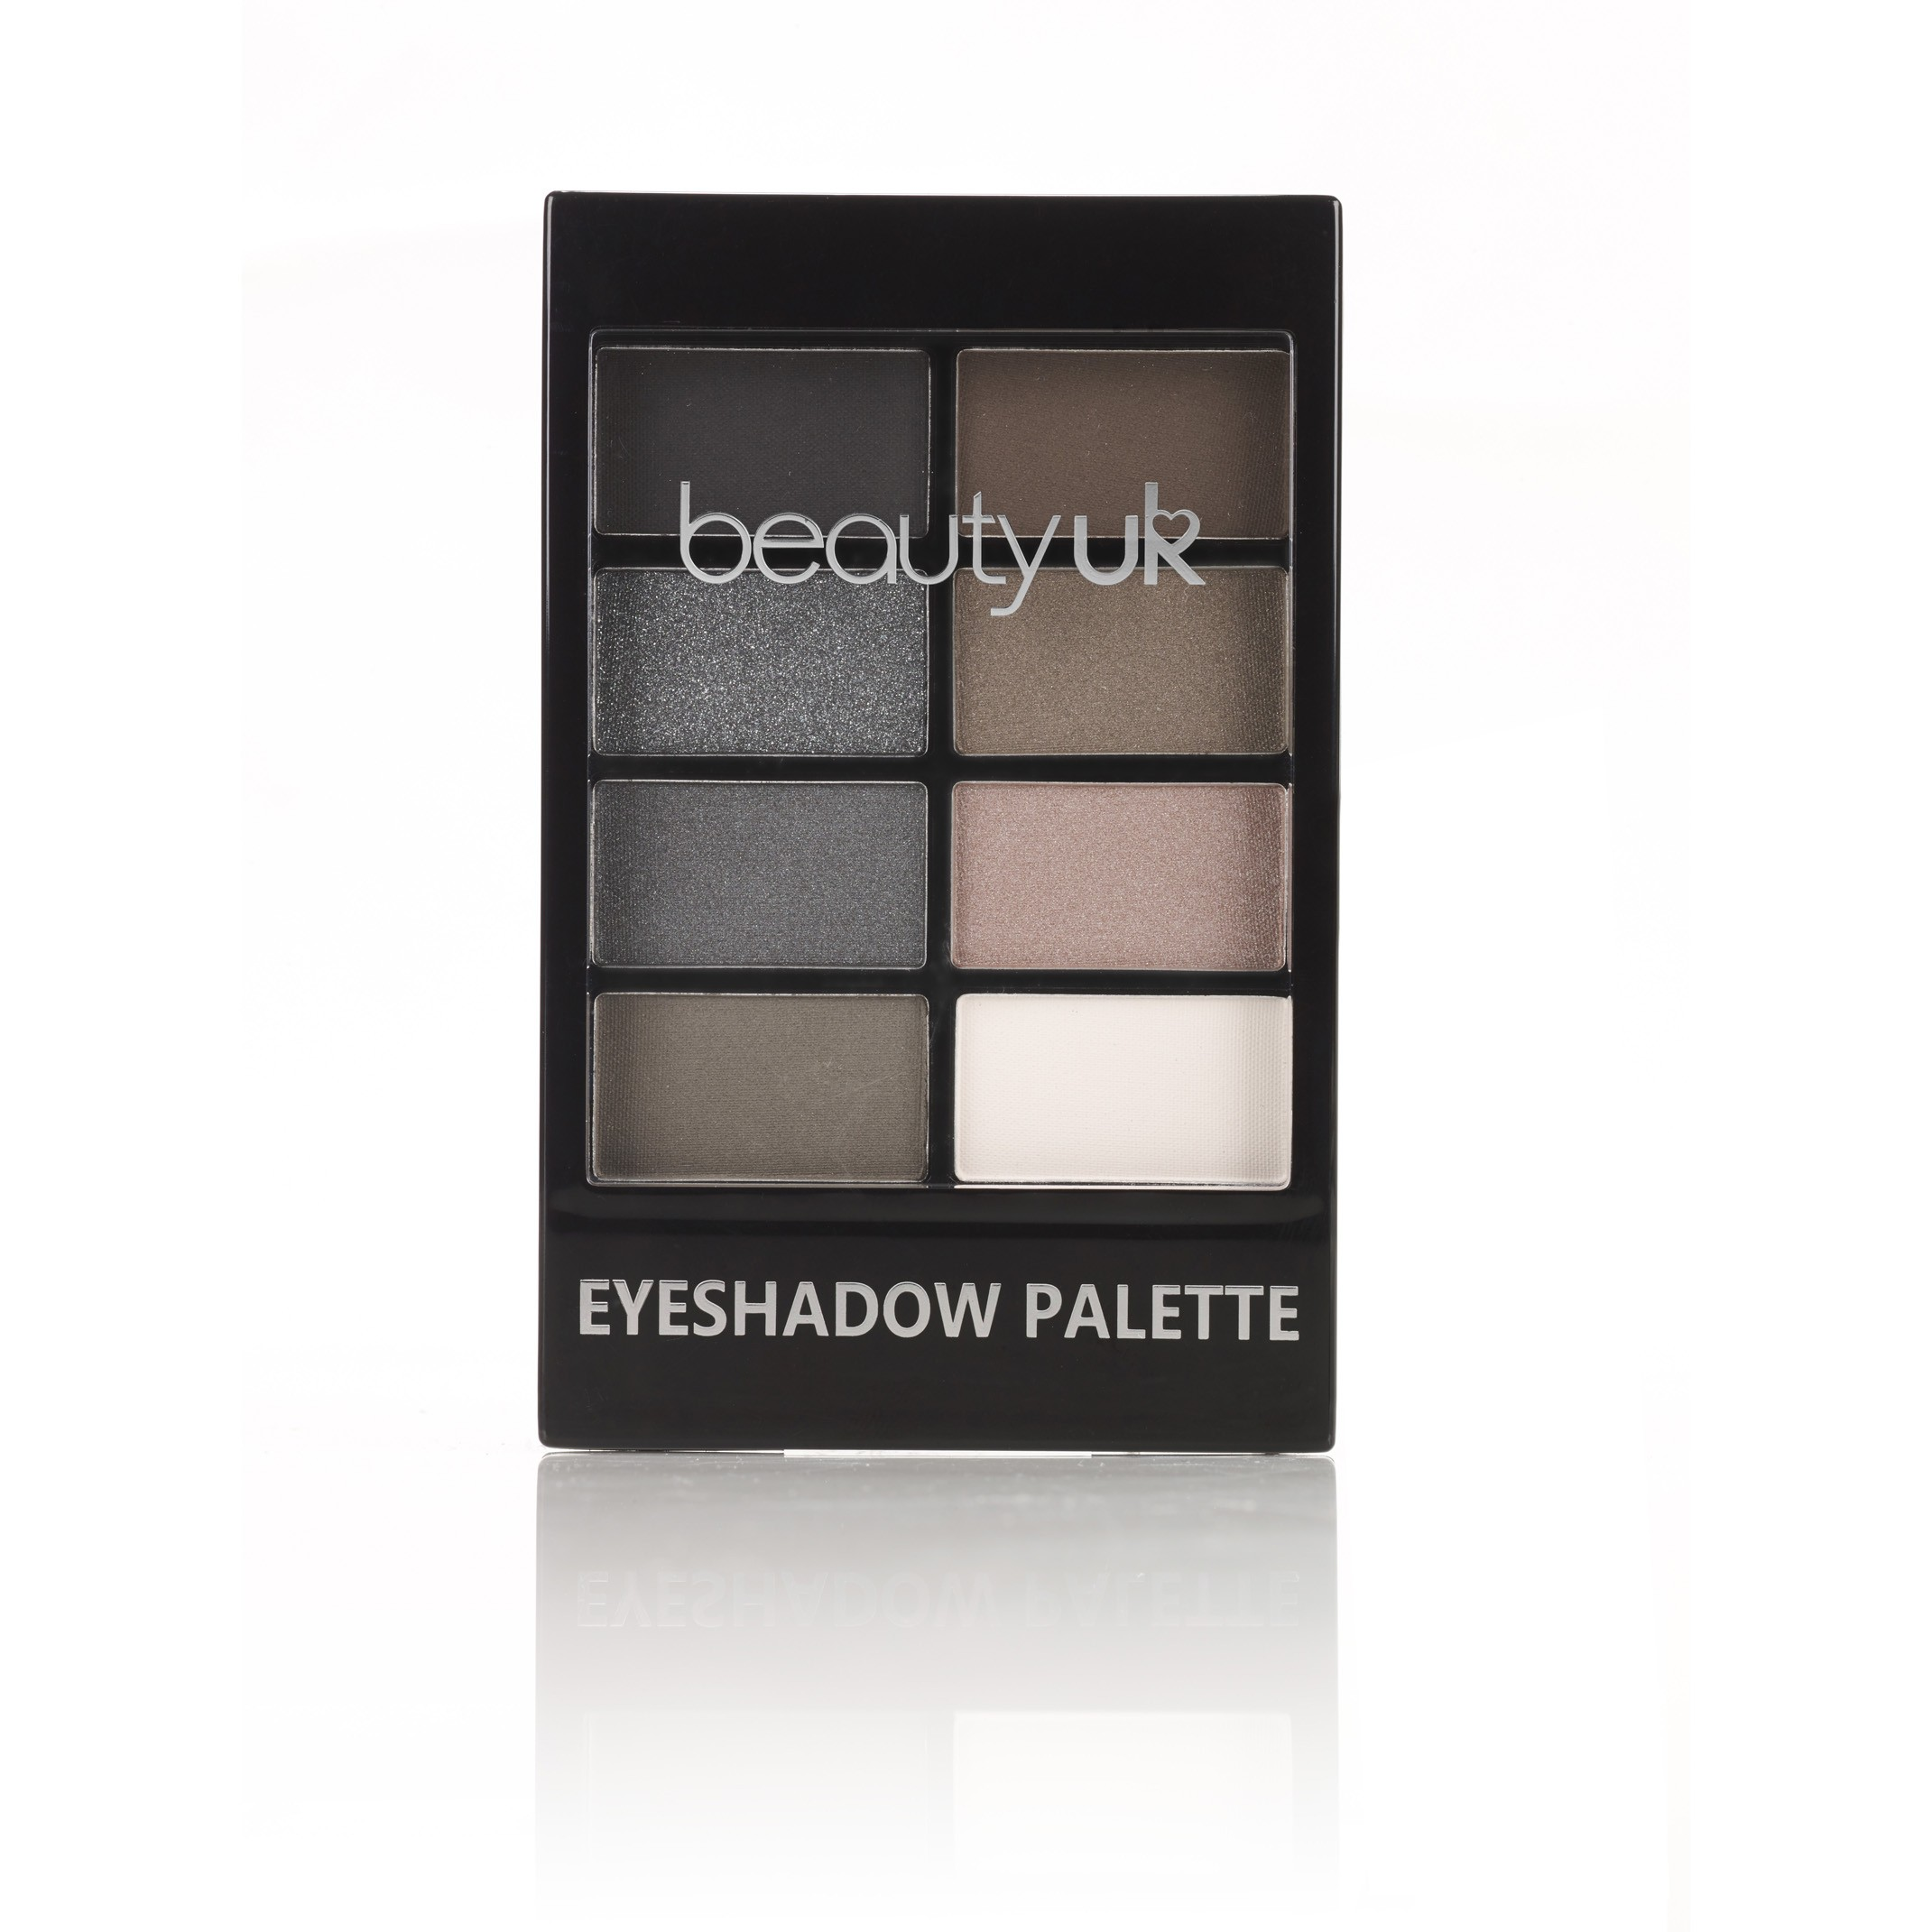 Image of beautyUK - Lidschatten-Palette - Eyeshadow Palette (ES024BV)